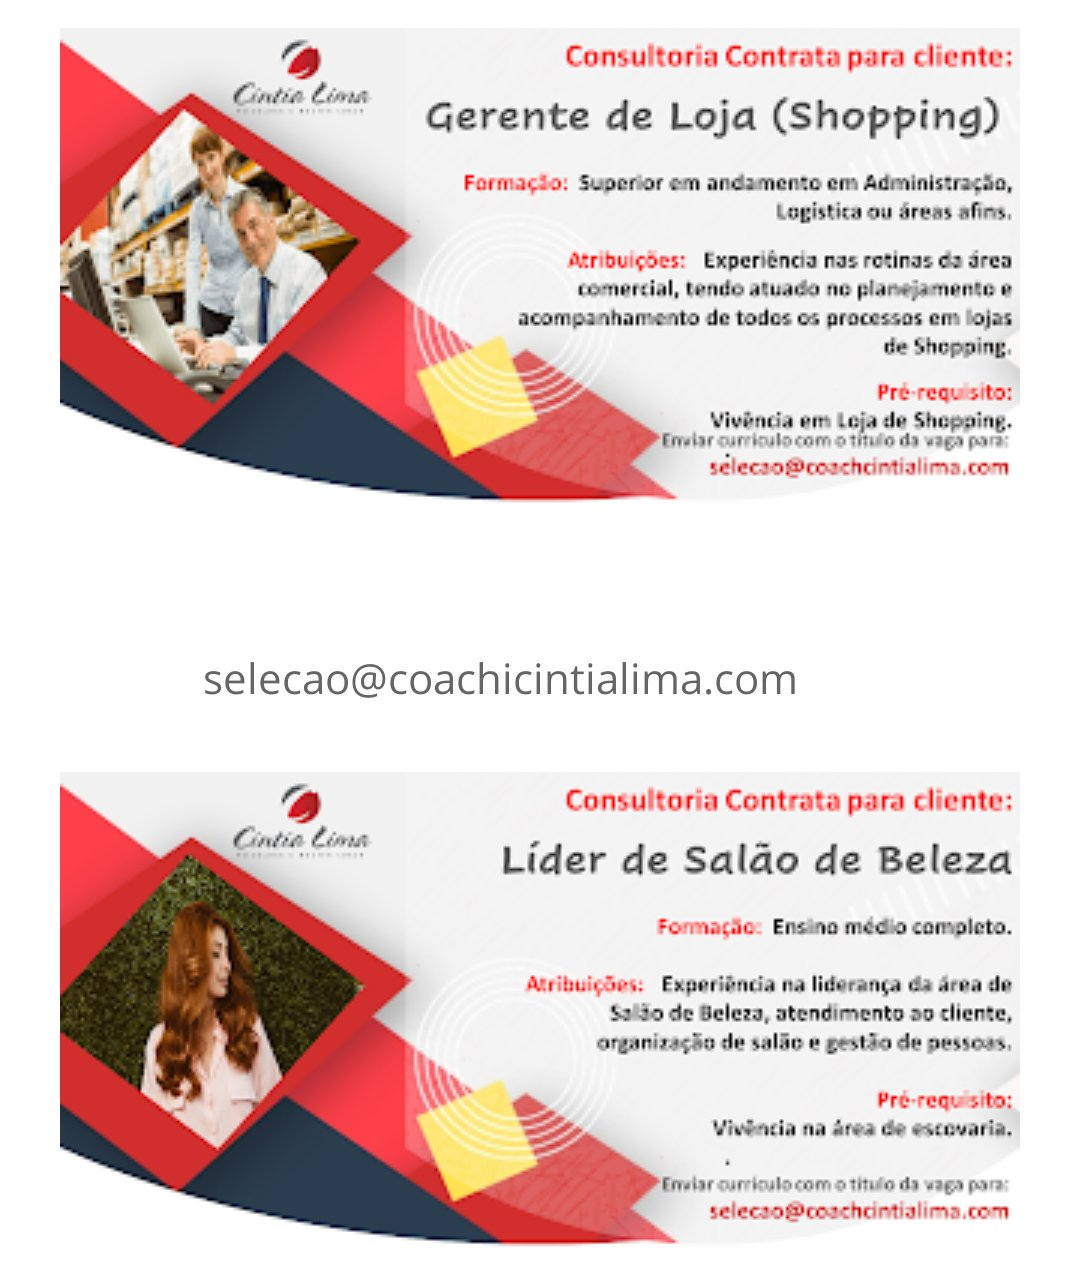 Consultora contrata para seu cliente; Líder de salão de beleza & Gerente de Loja (shopping)